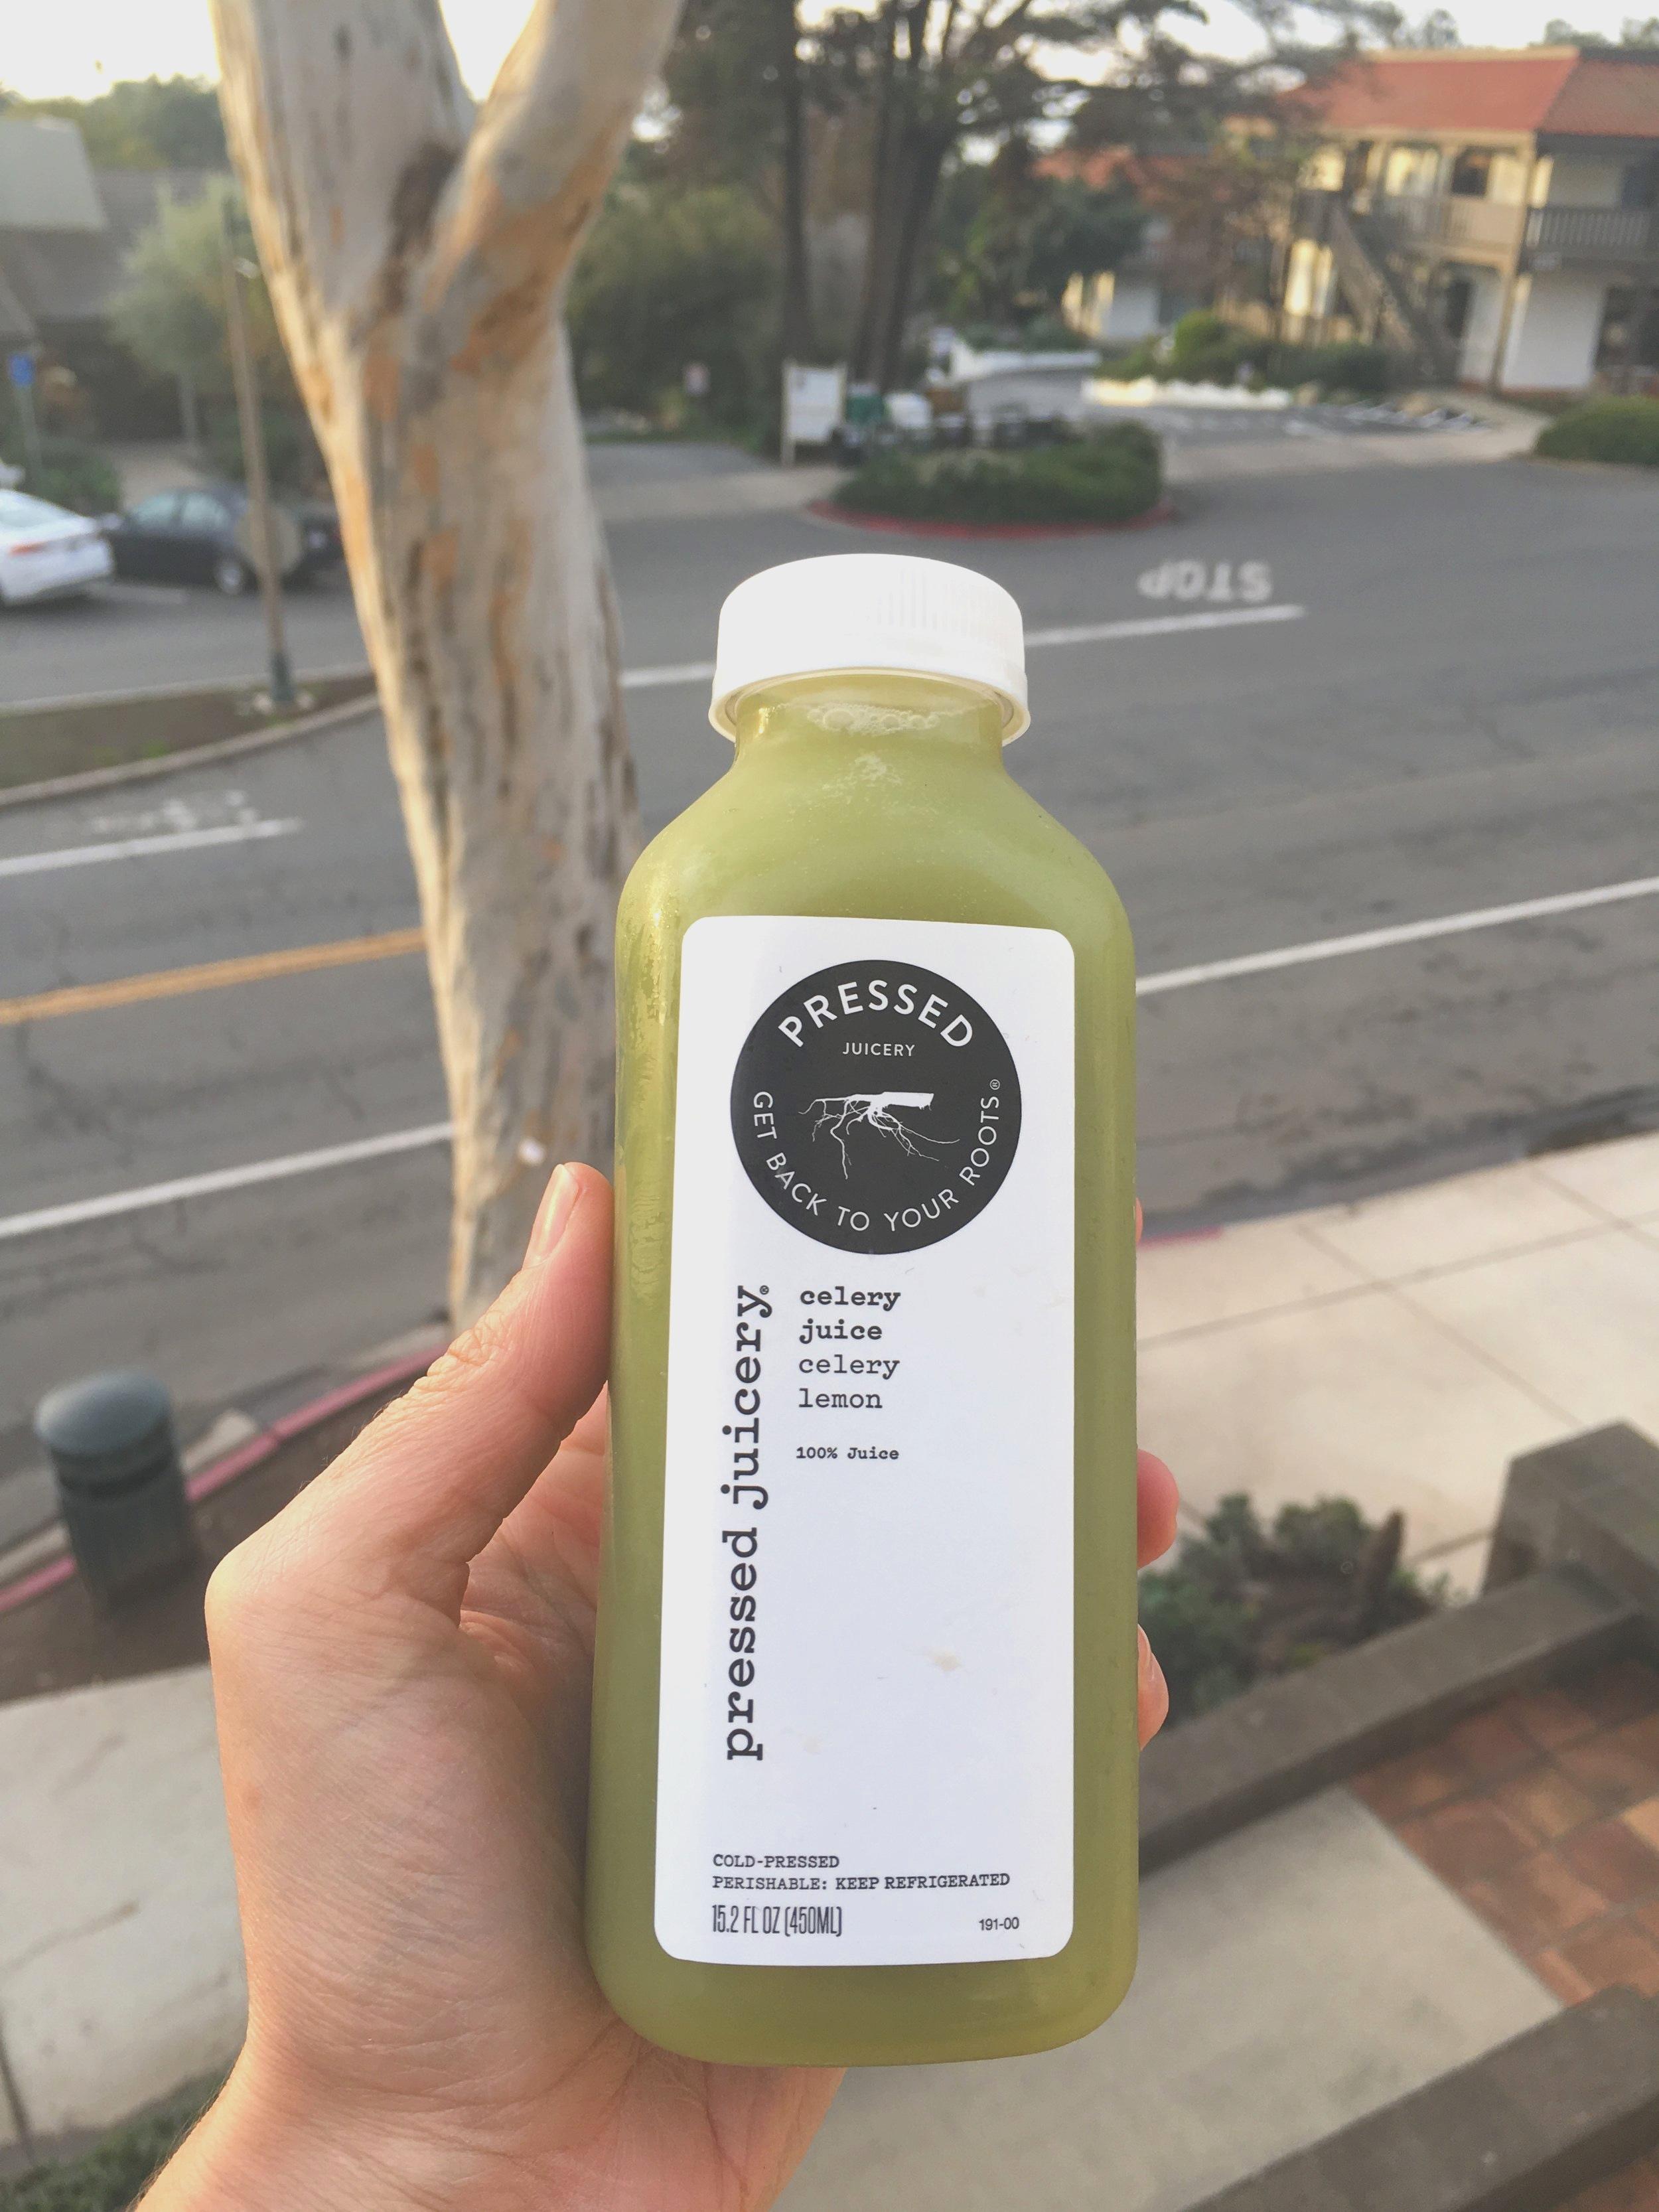 104 Pressed Juices -